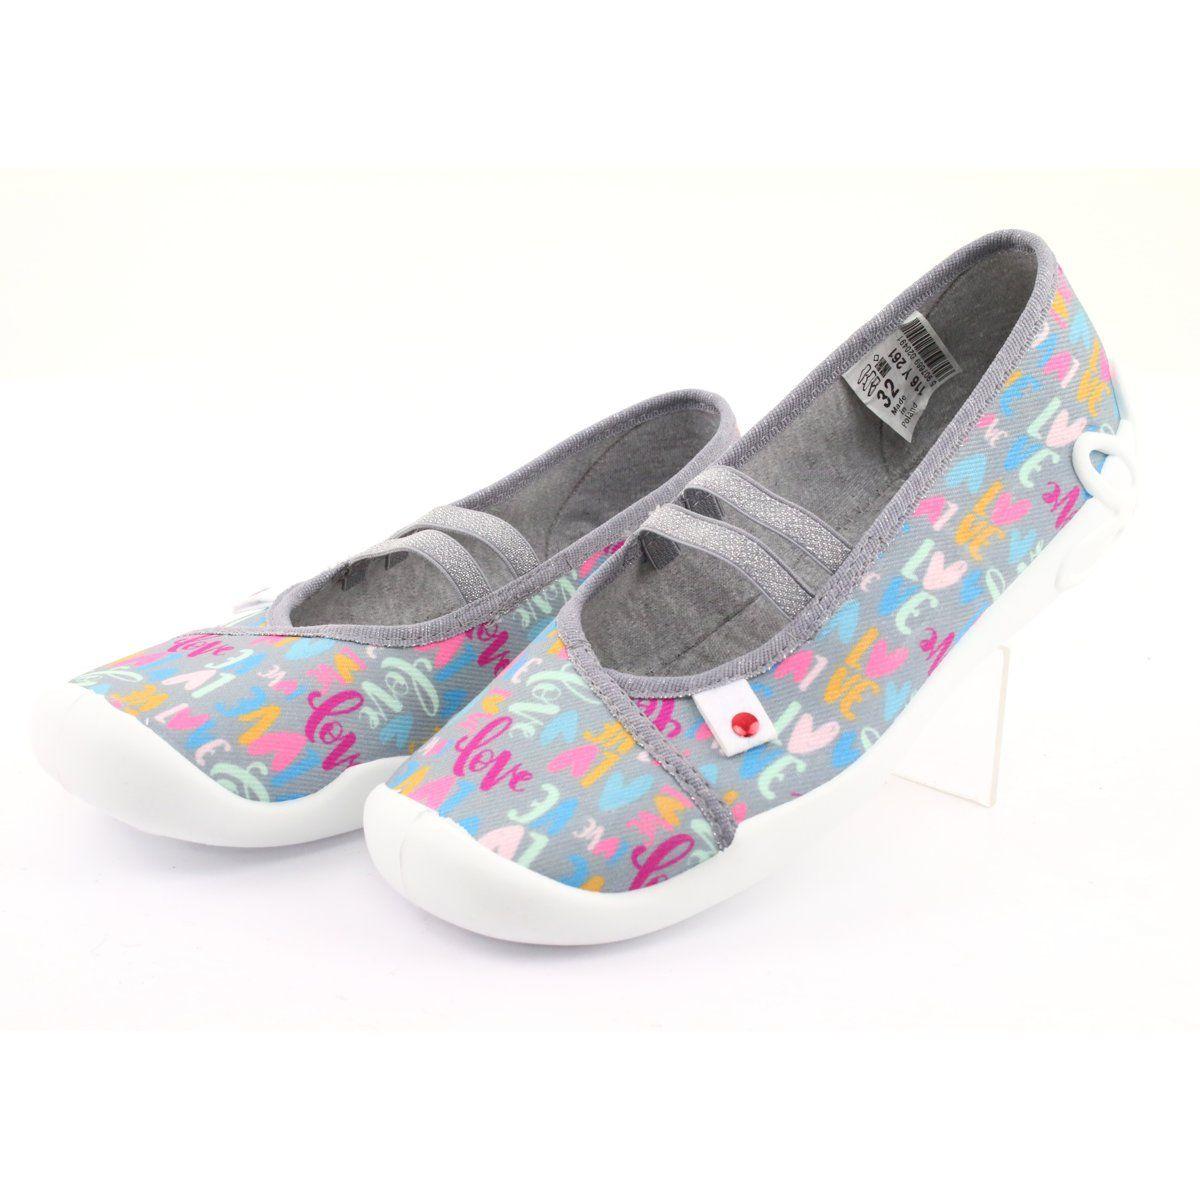 Befado Obuwie Dzieciece 116y261 Childrens Shoes Kid Shoes Childrens Slippers